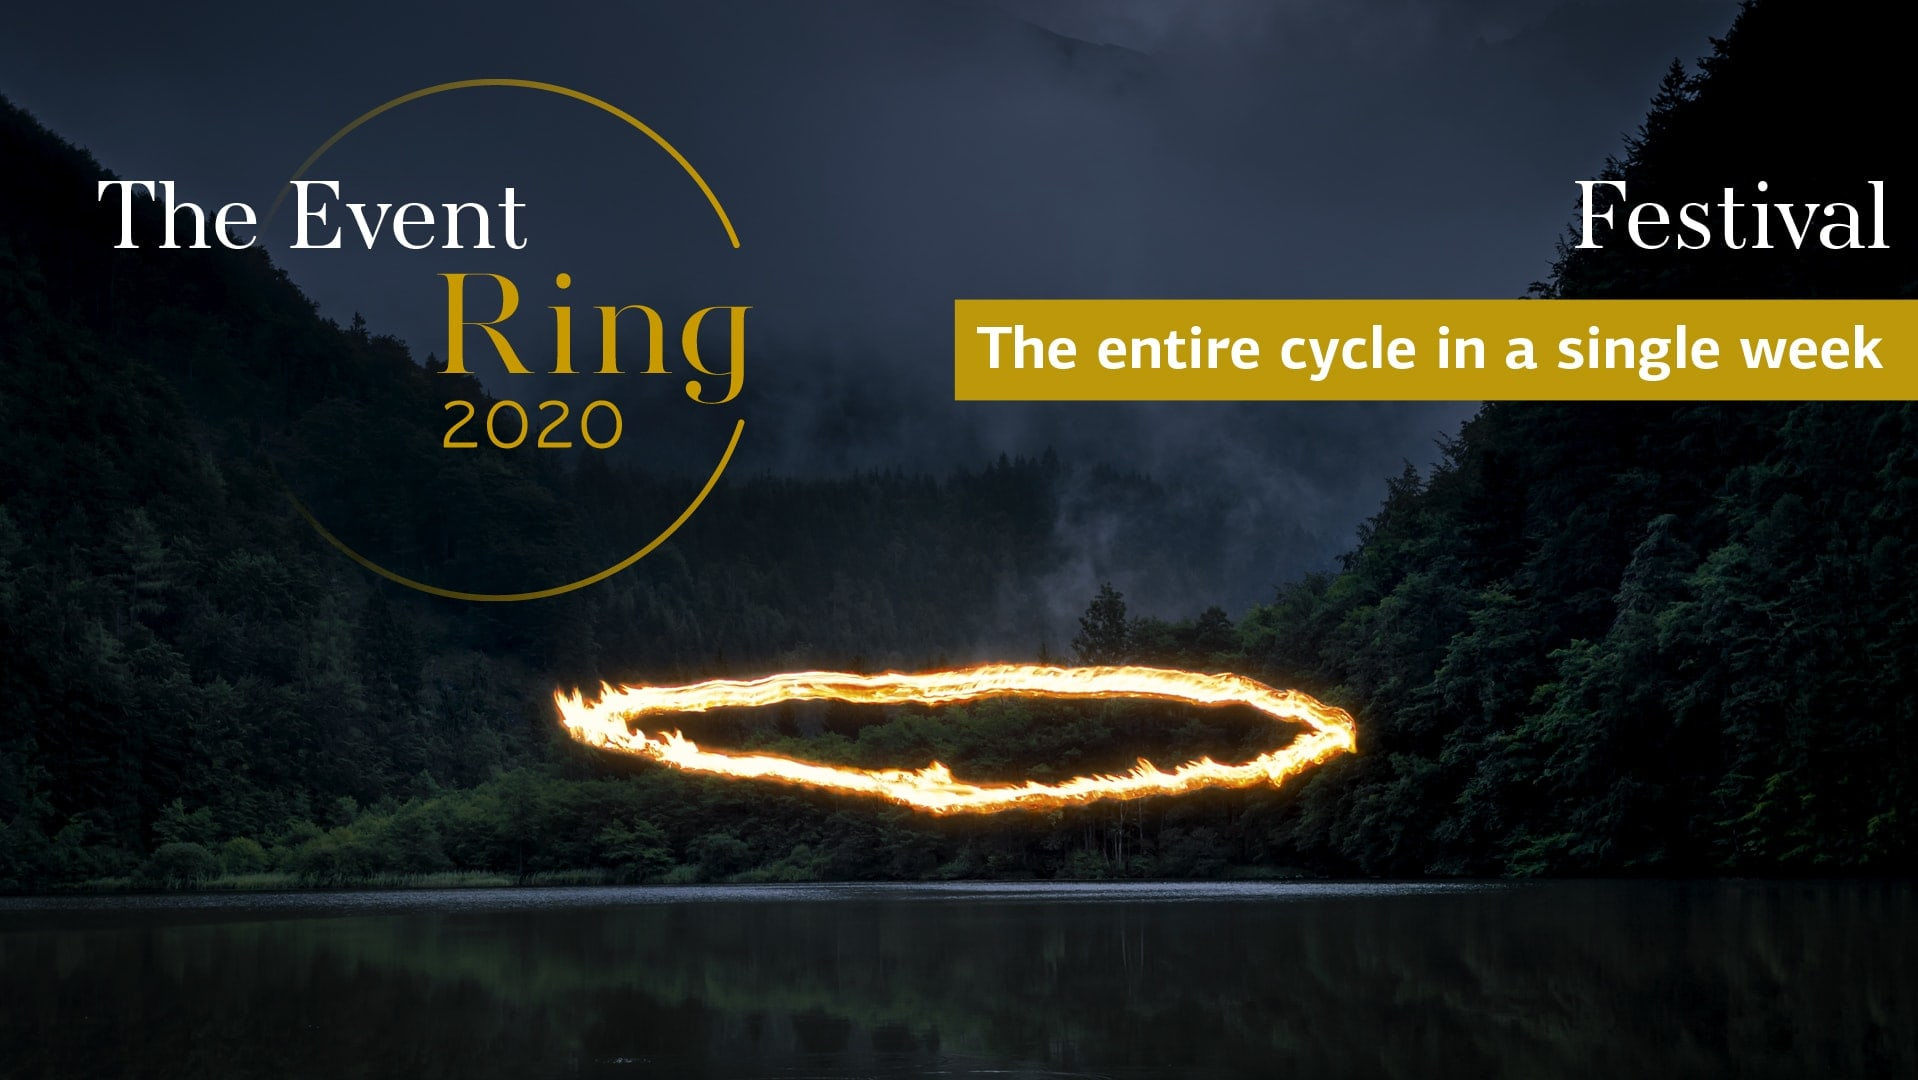 The Ring Festival